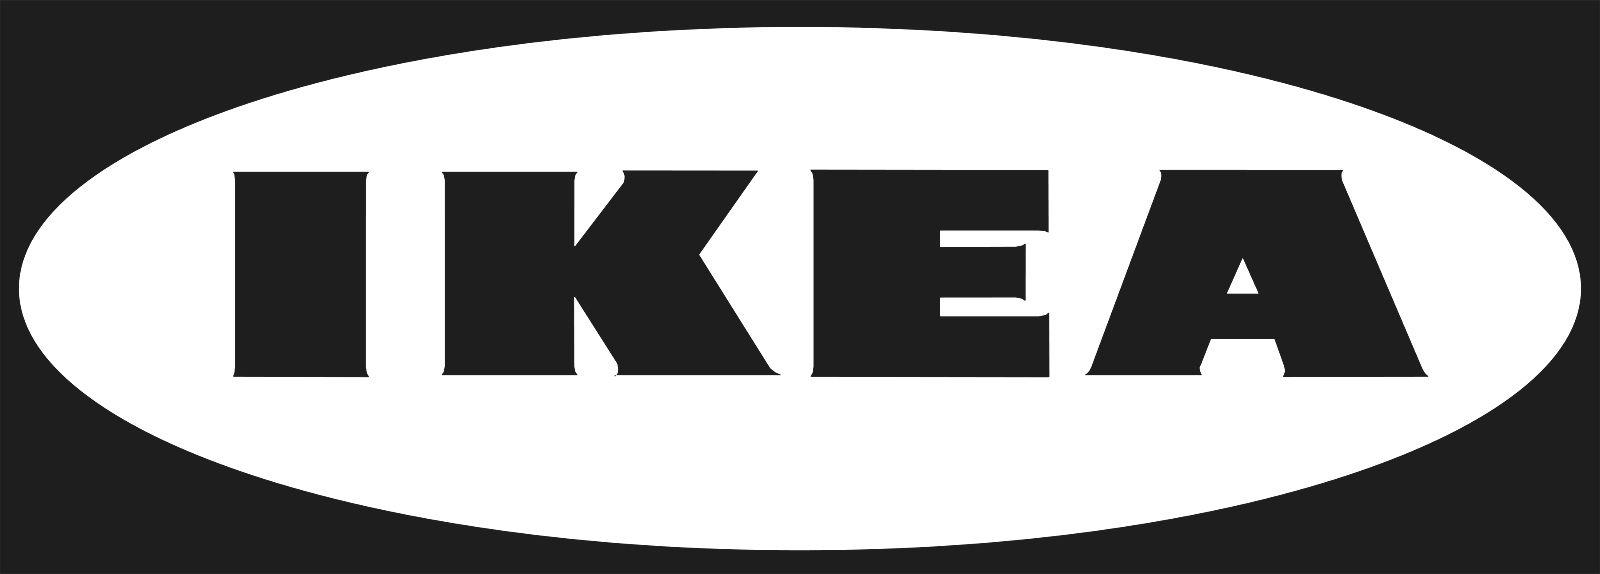 Ikea Emblem Criticism Ikea Logo Ikea Logos